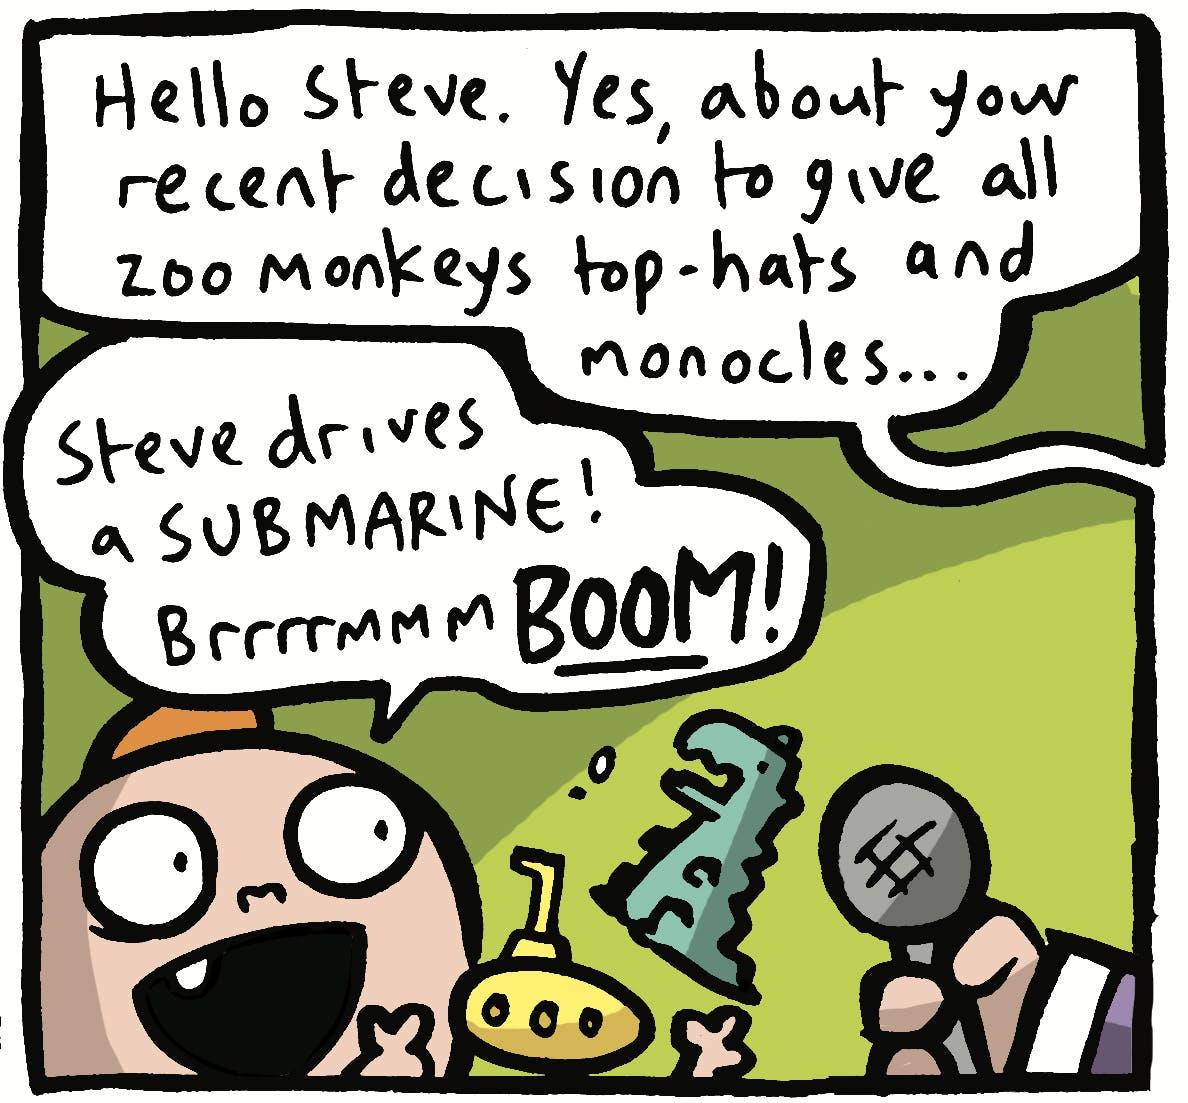 ...who drives a submarine